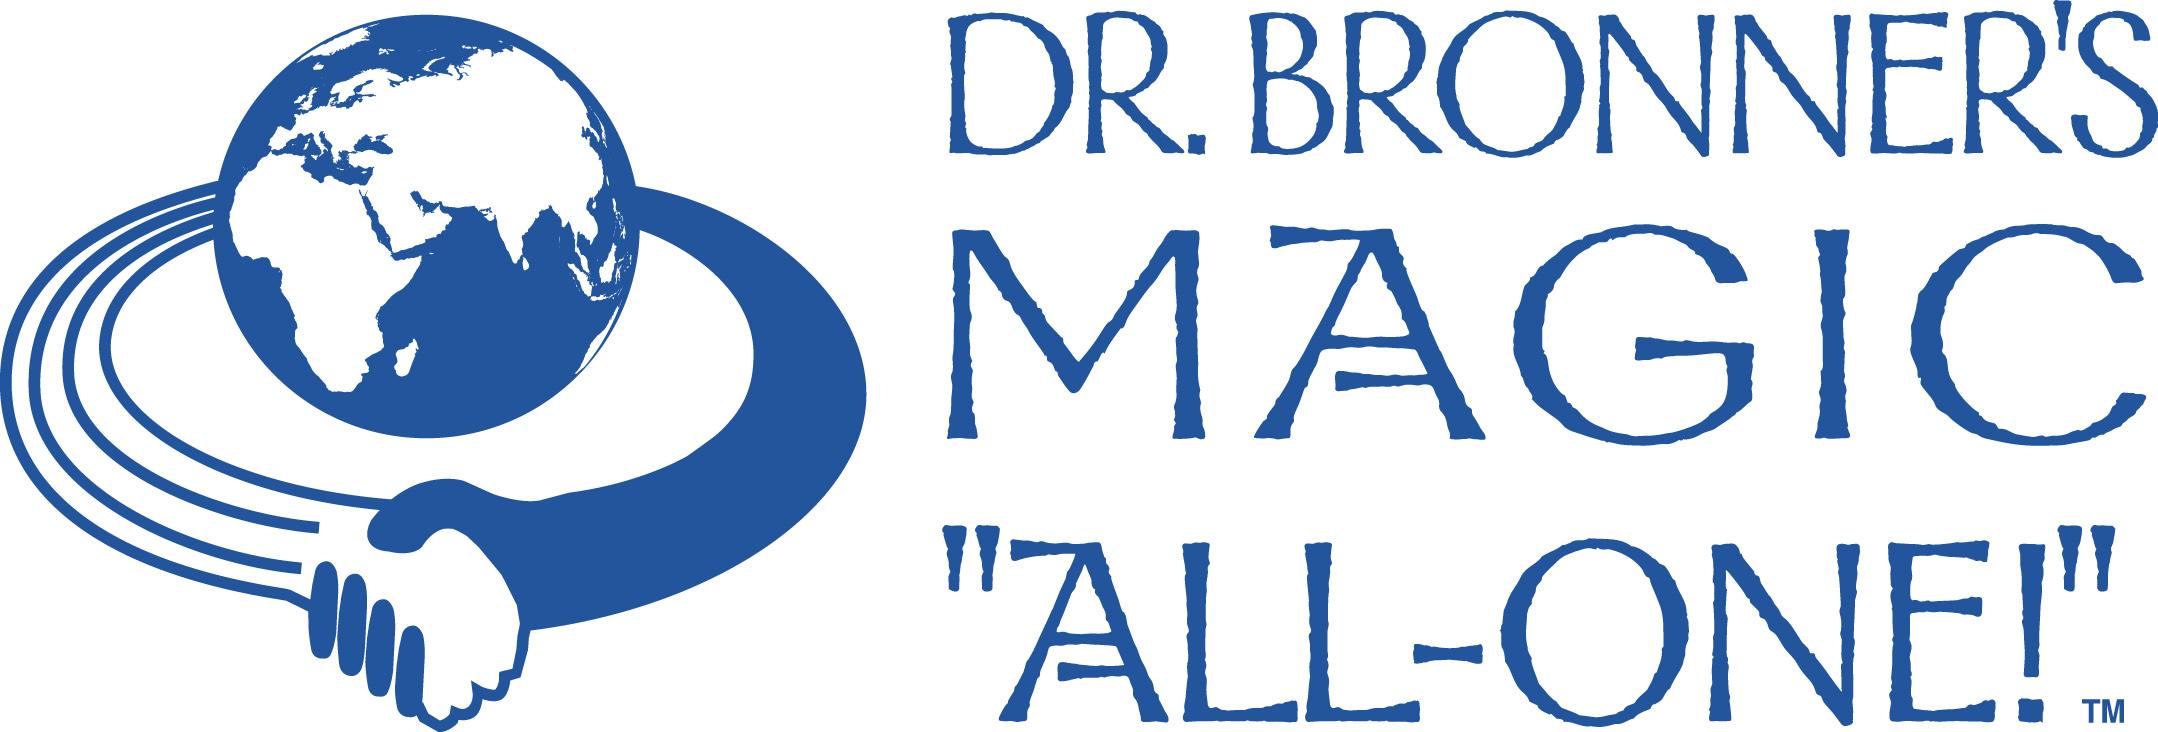 Bronner_logo5929bdcfbb028